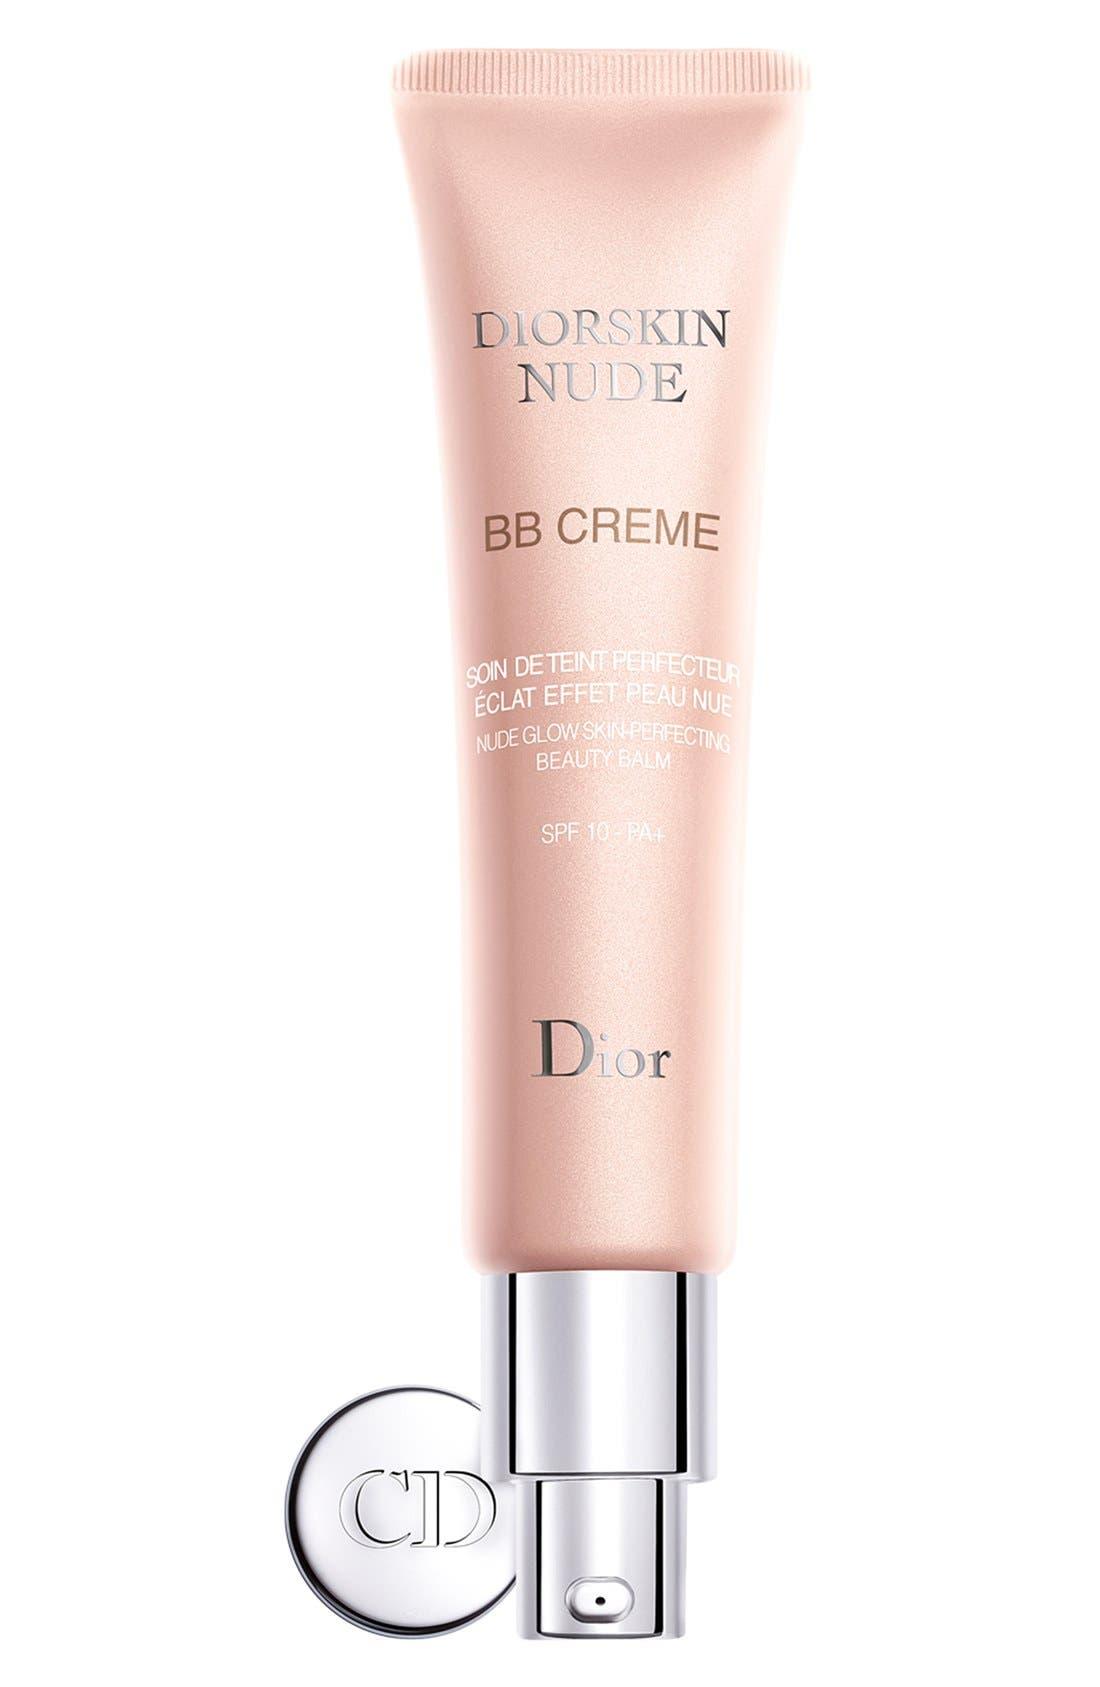 'Diorskin Nude' BB Creme Broad Spectrum SPF 10,                             Main thumbnail 1, color,                             250